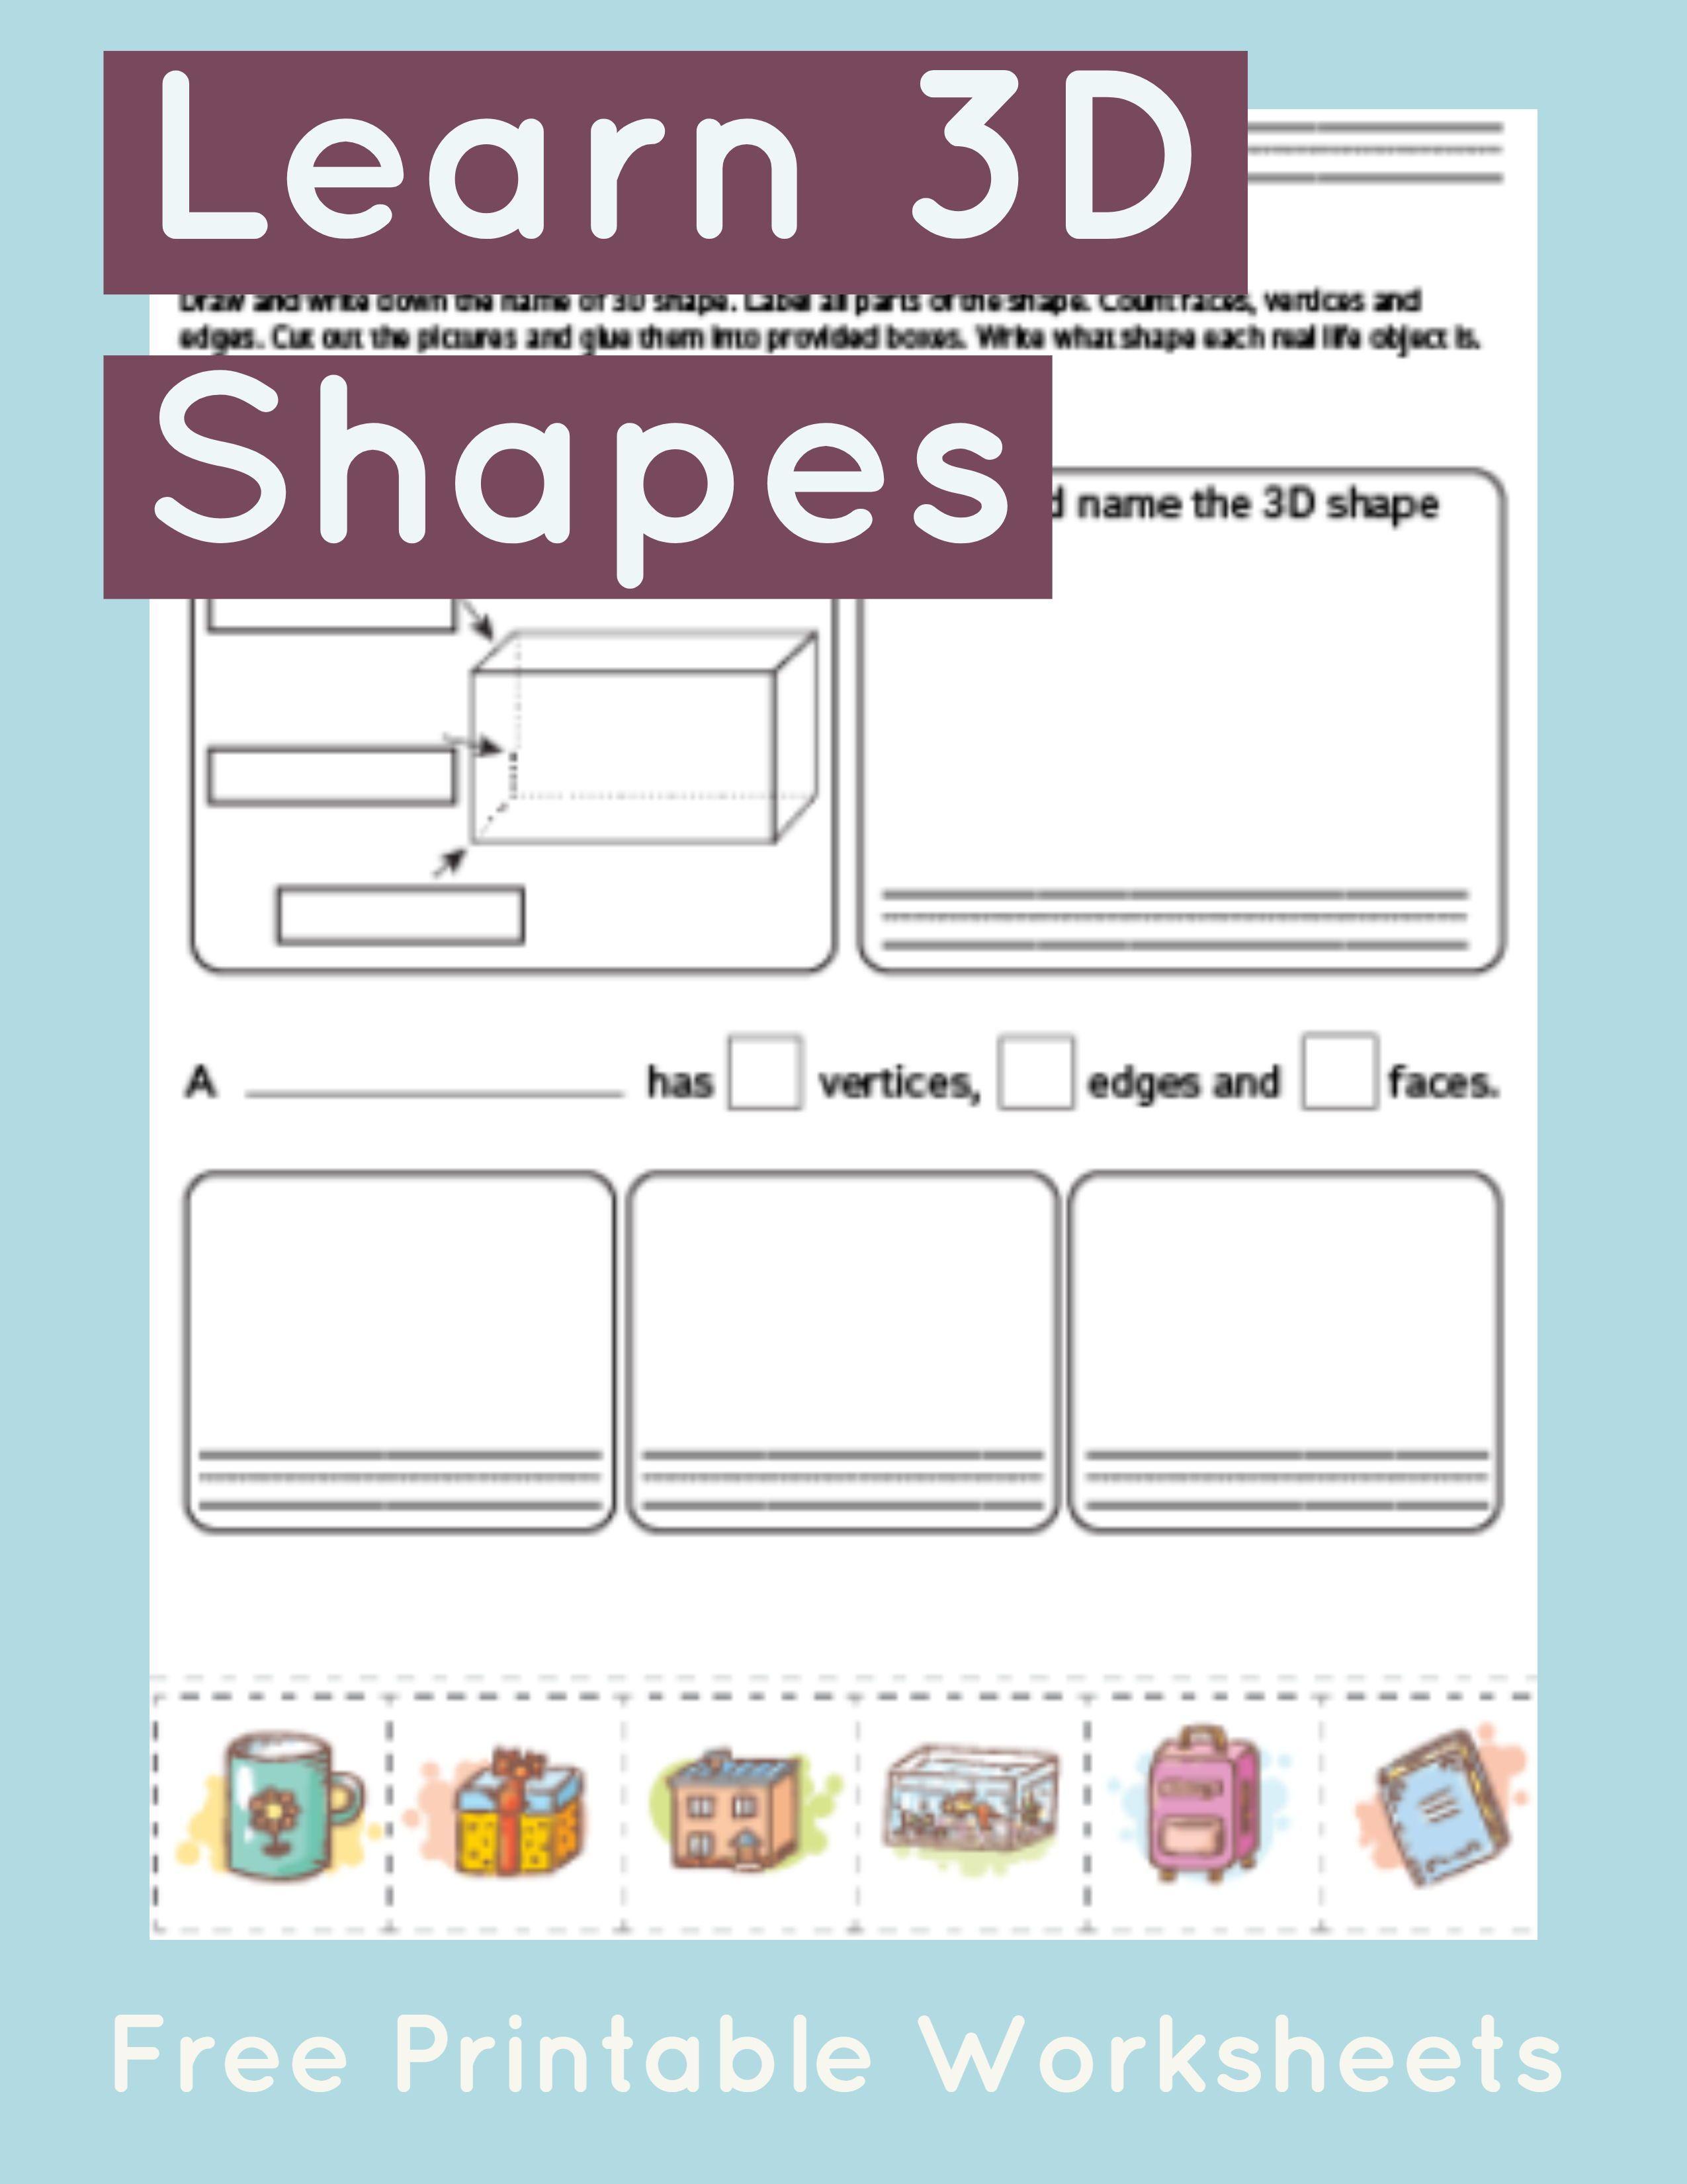 Rectangular Prism Worksheet Primarylearning Org Shapes Worksheet Kindergarten Math Worksheets Free Math